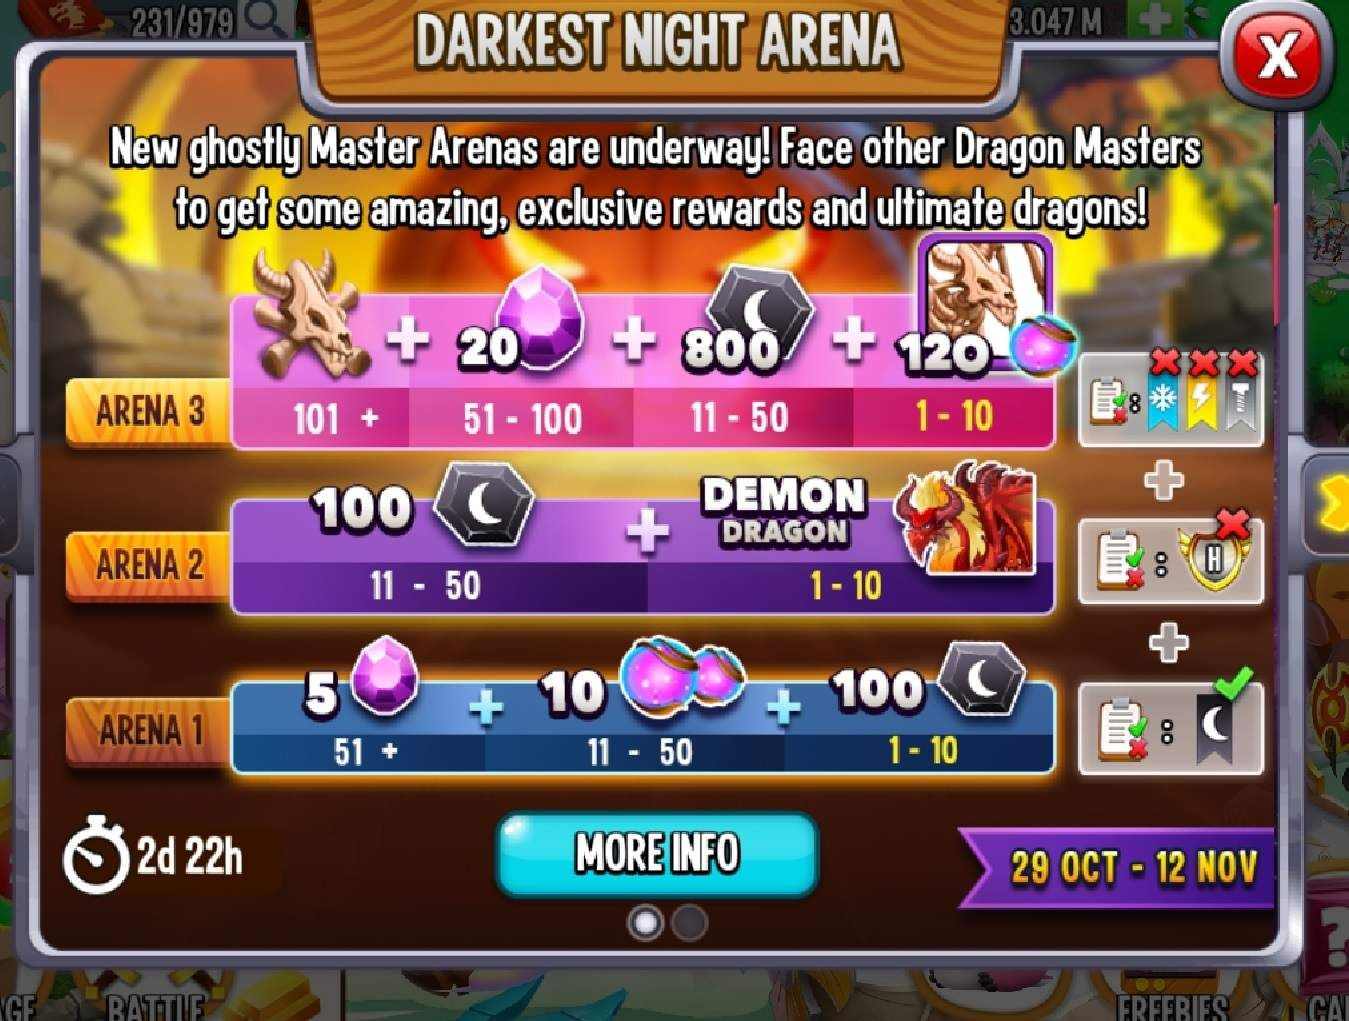 0_1540992702194_102918 darkest night season 1 rewards.png